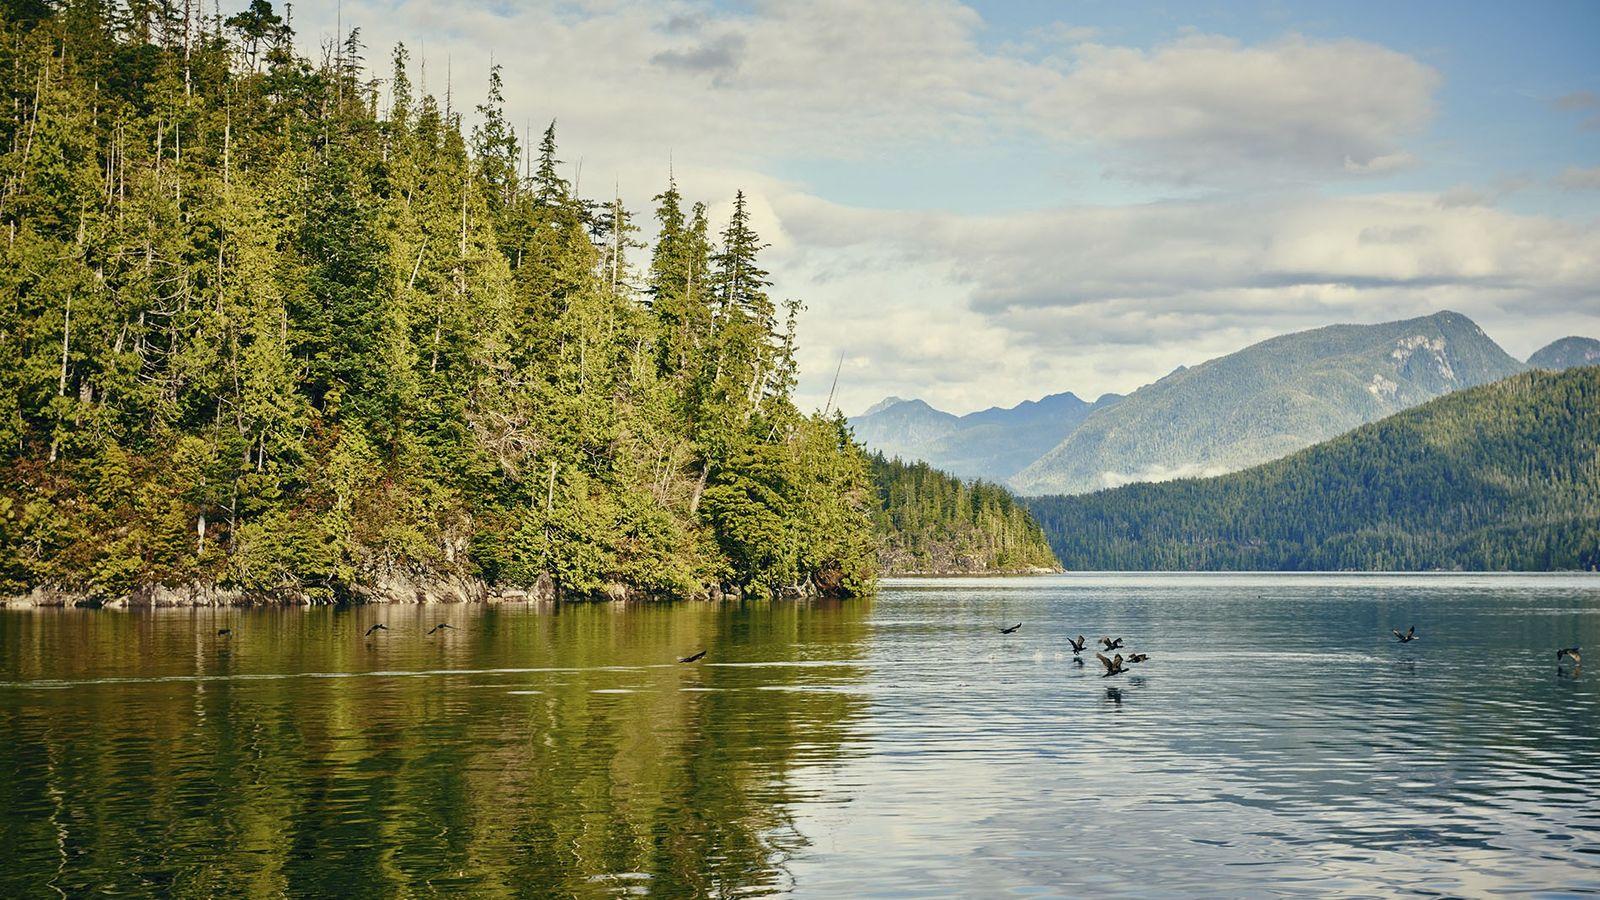 A serene Tofino inlet, Canada.